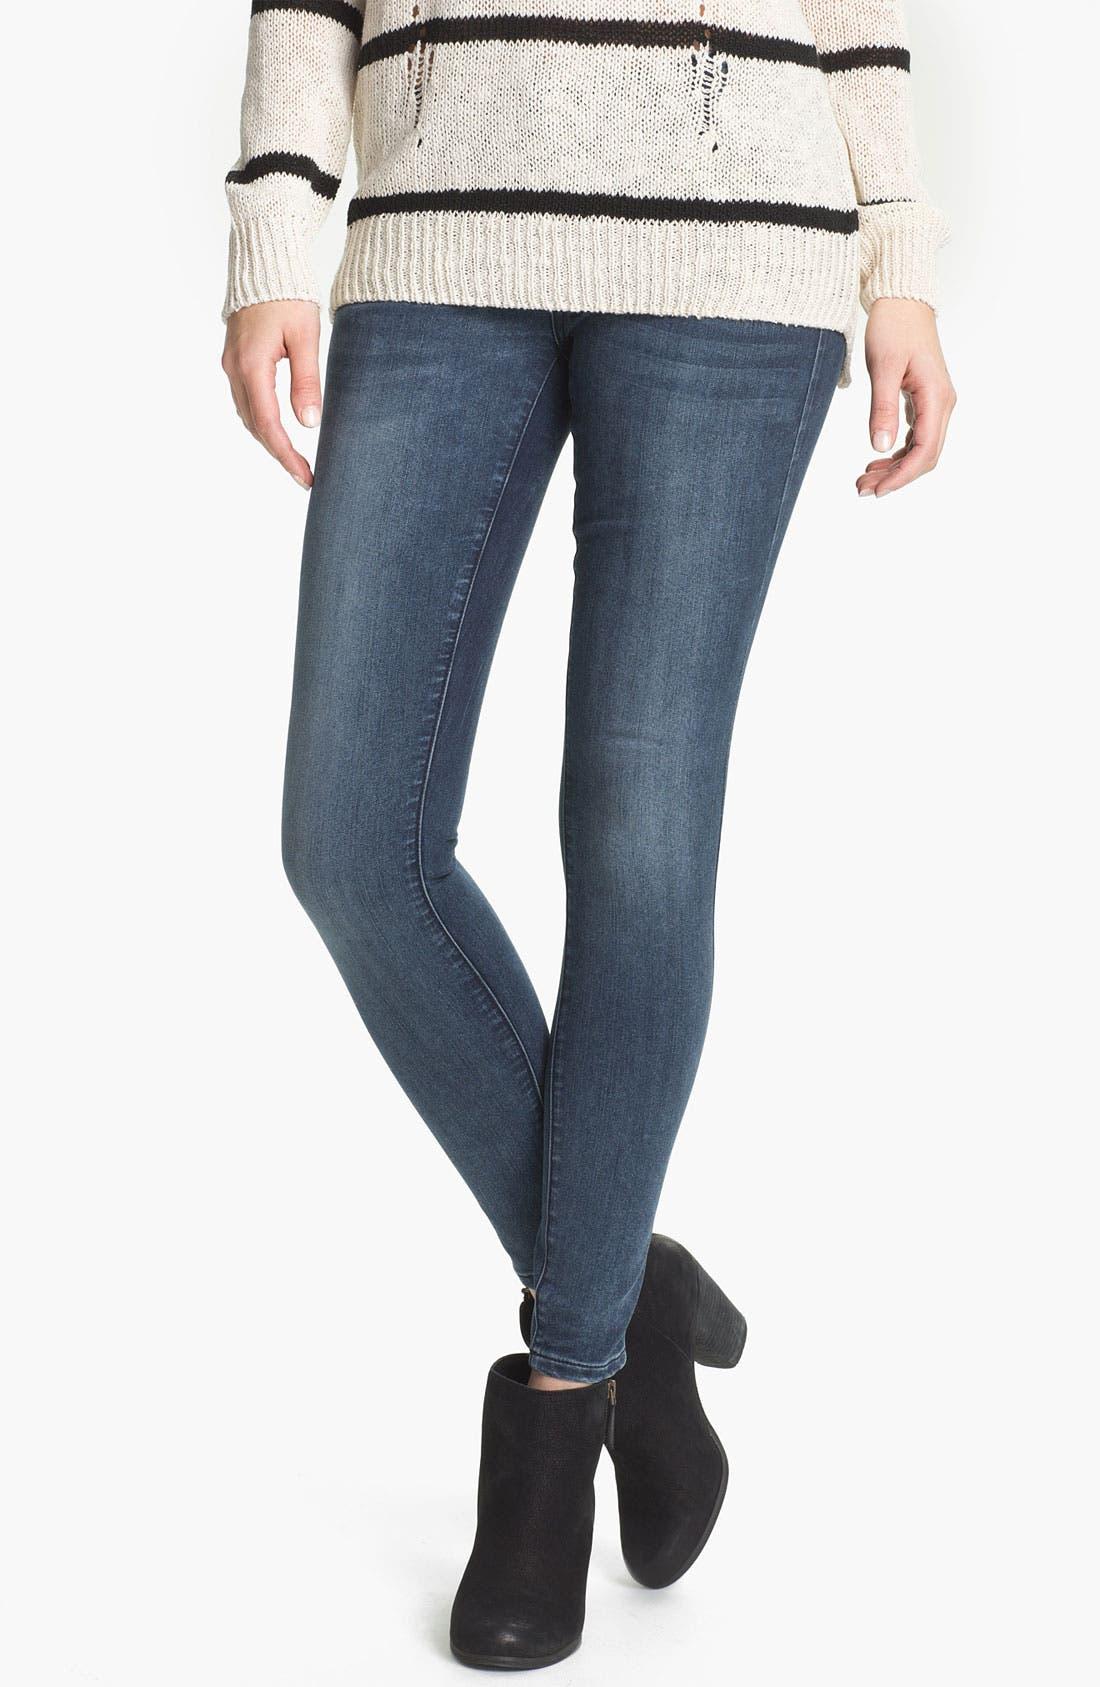 Alternate Image 1 Selected - STS Blue Super Skinny Jeans (Avalon Beach) (Juniors)